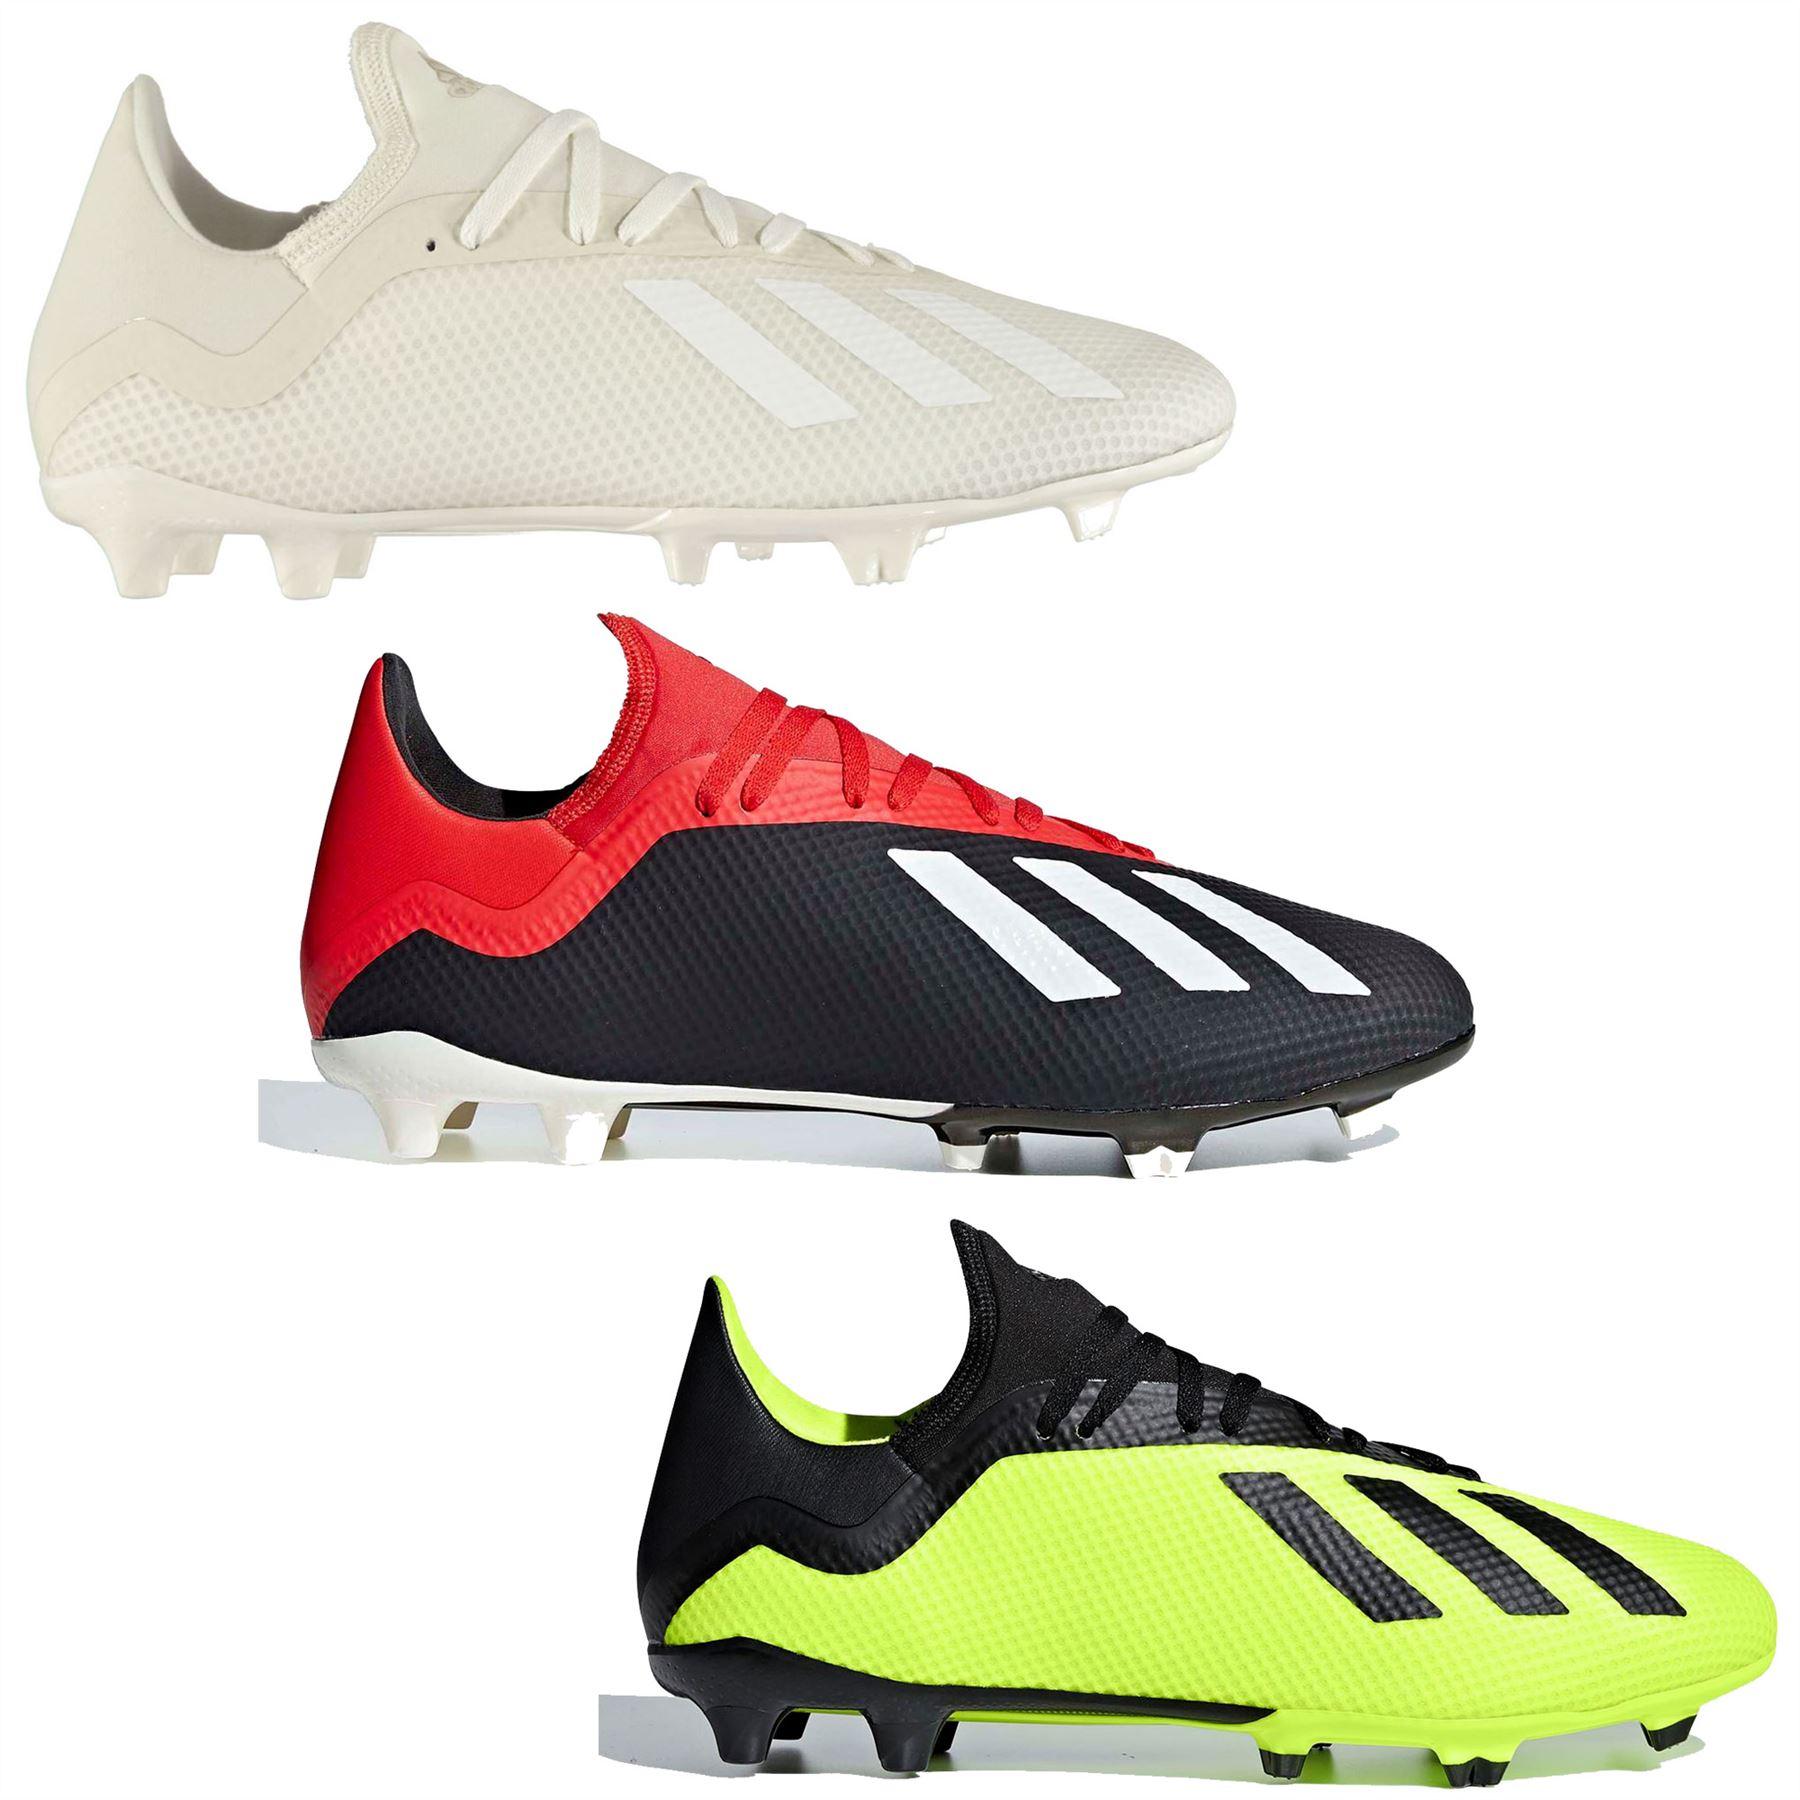 adidas 18.3 mens fg football boots